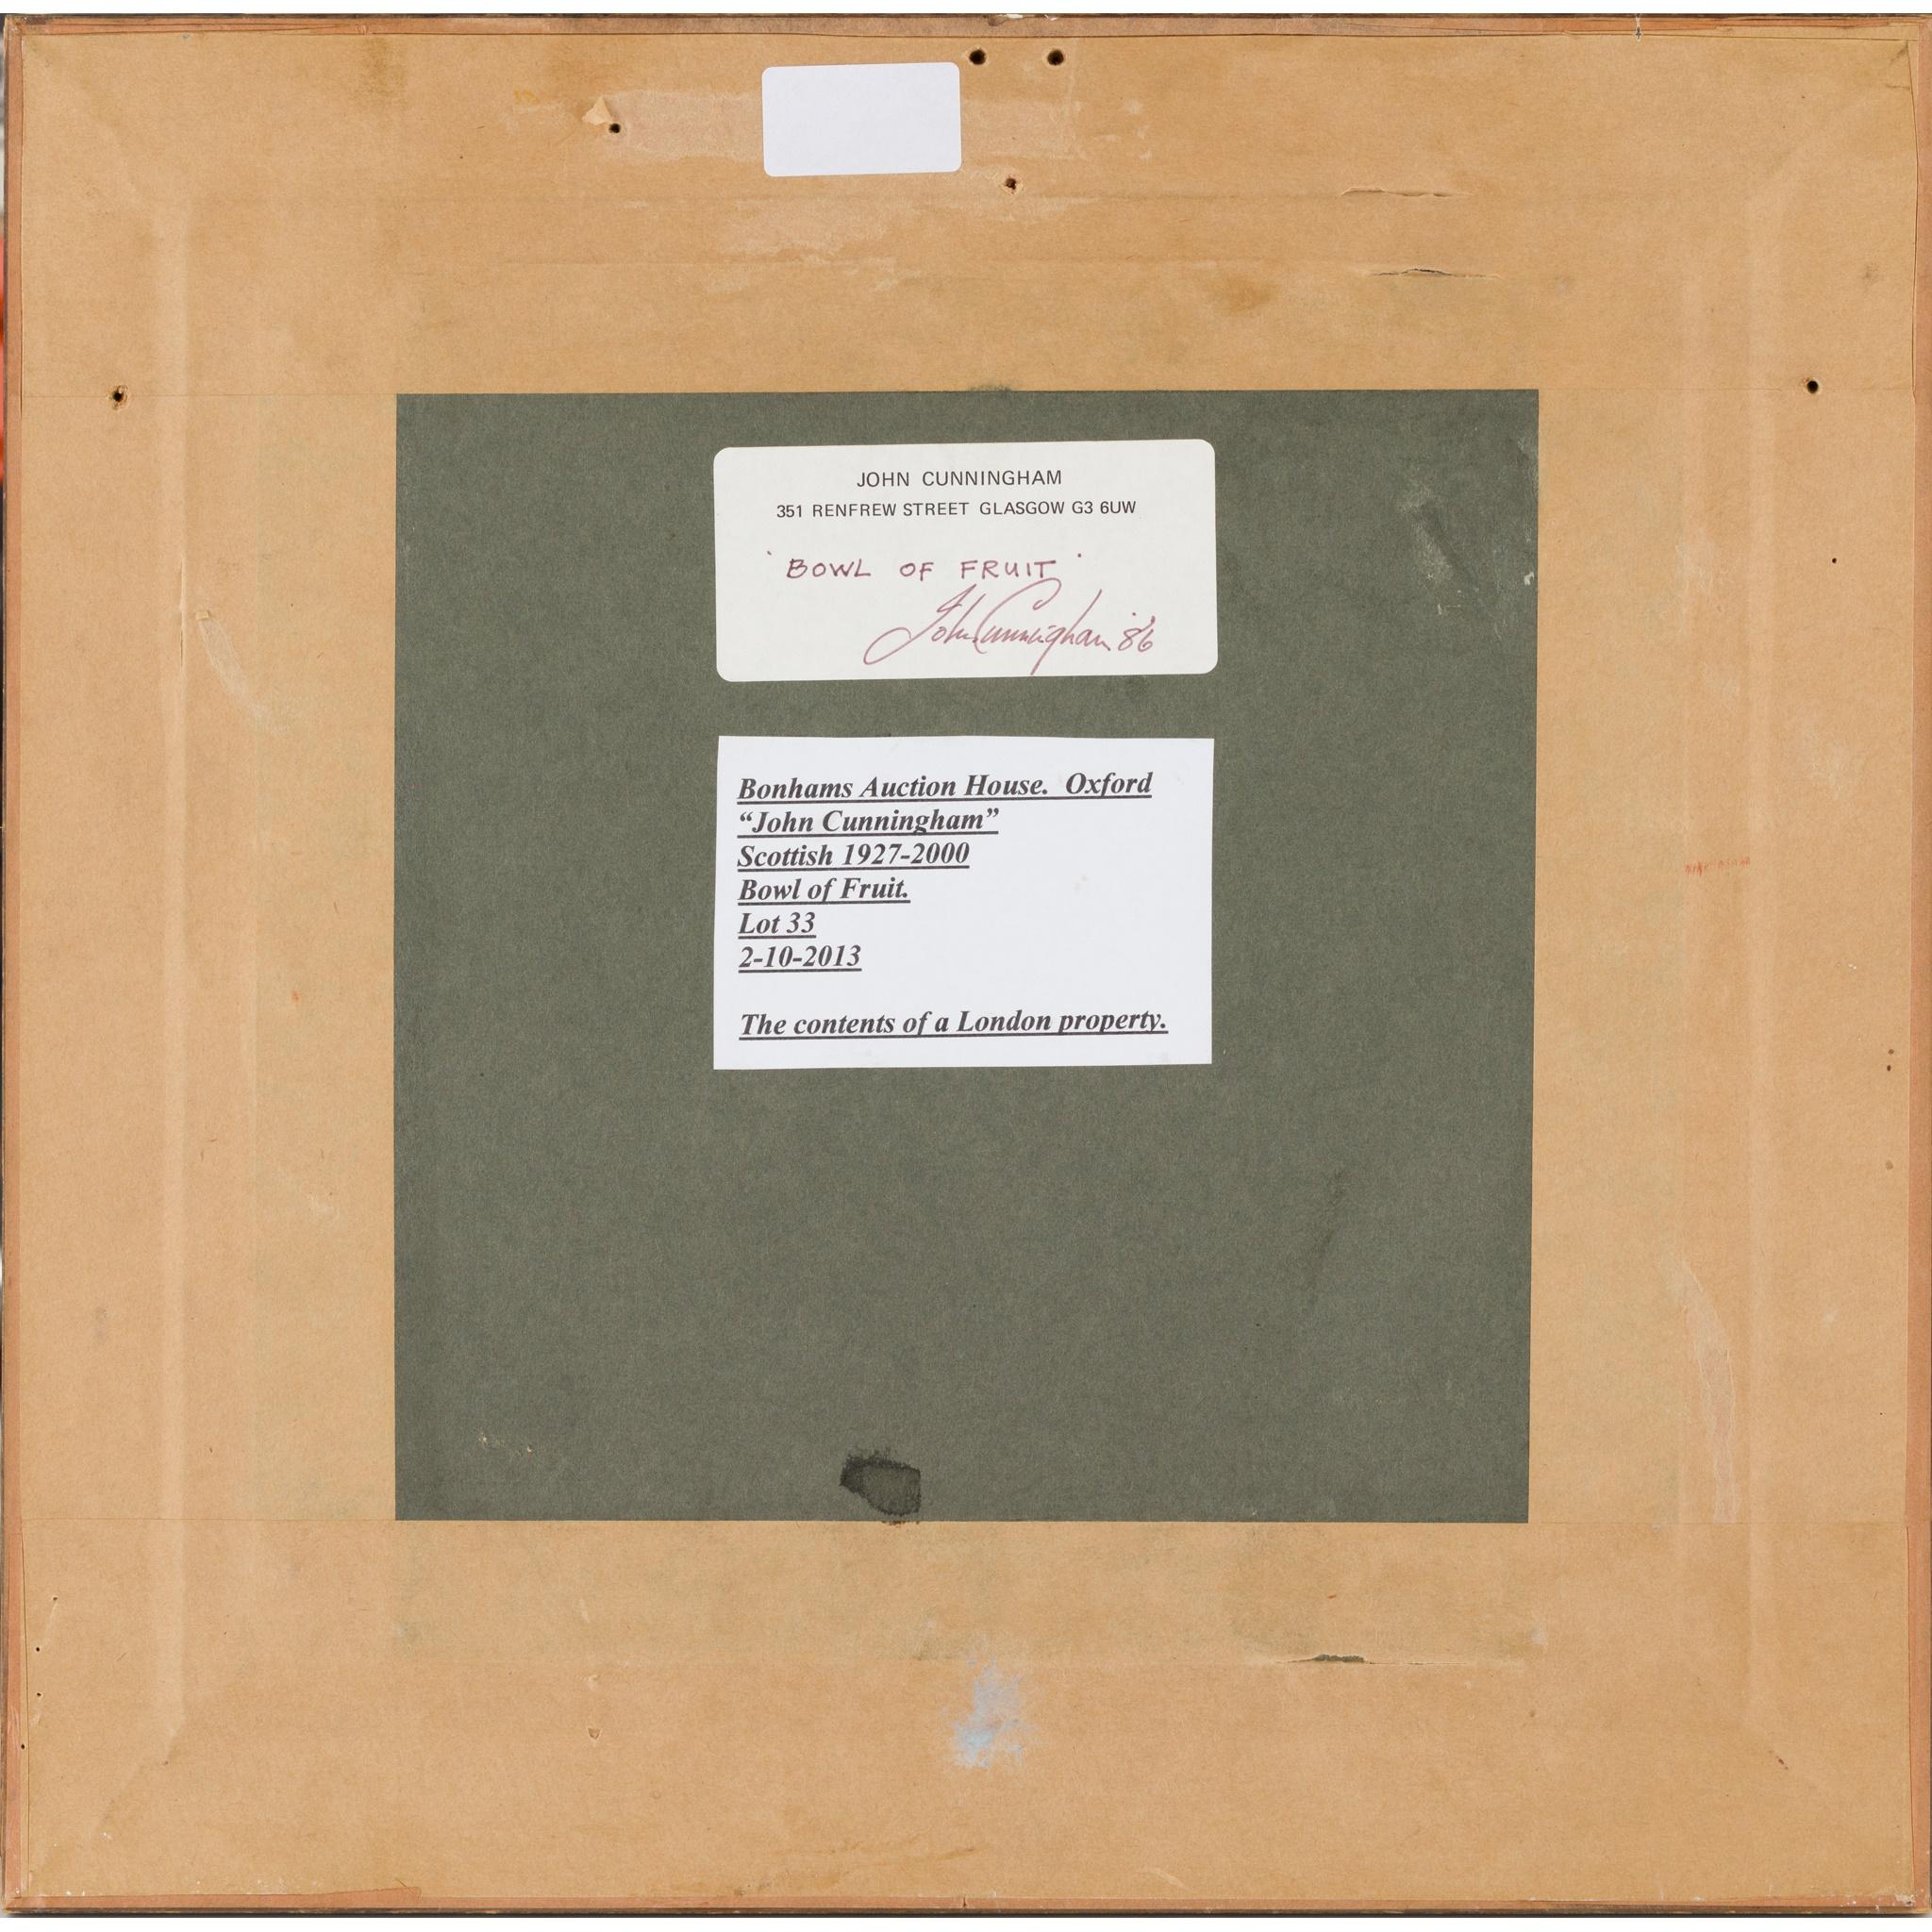 § JOHN CUNNINGHAM (SCOTTISH 1927-2000) BOWL OF FRUIT - Image 3 of 3